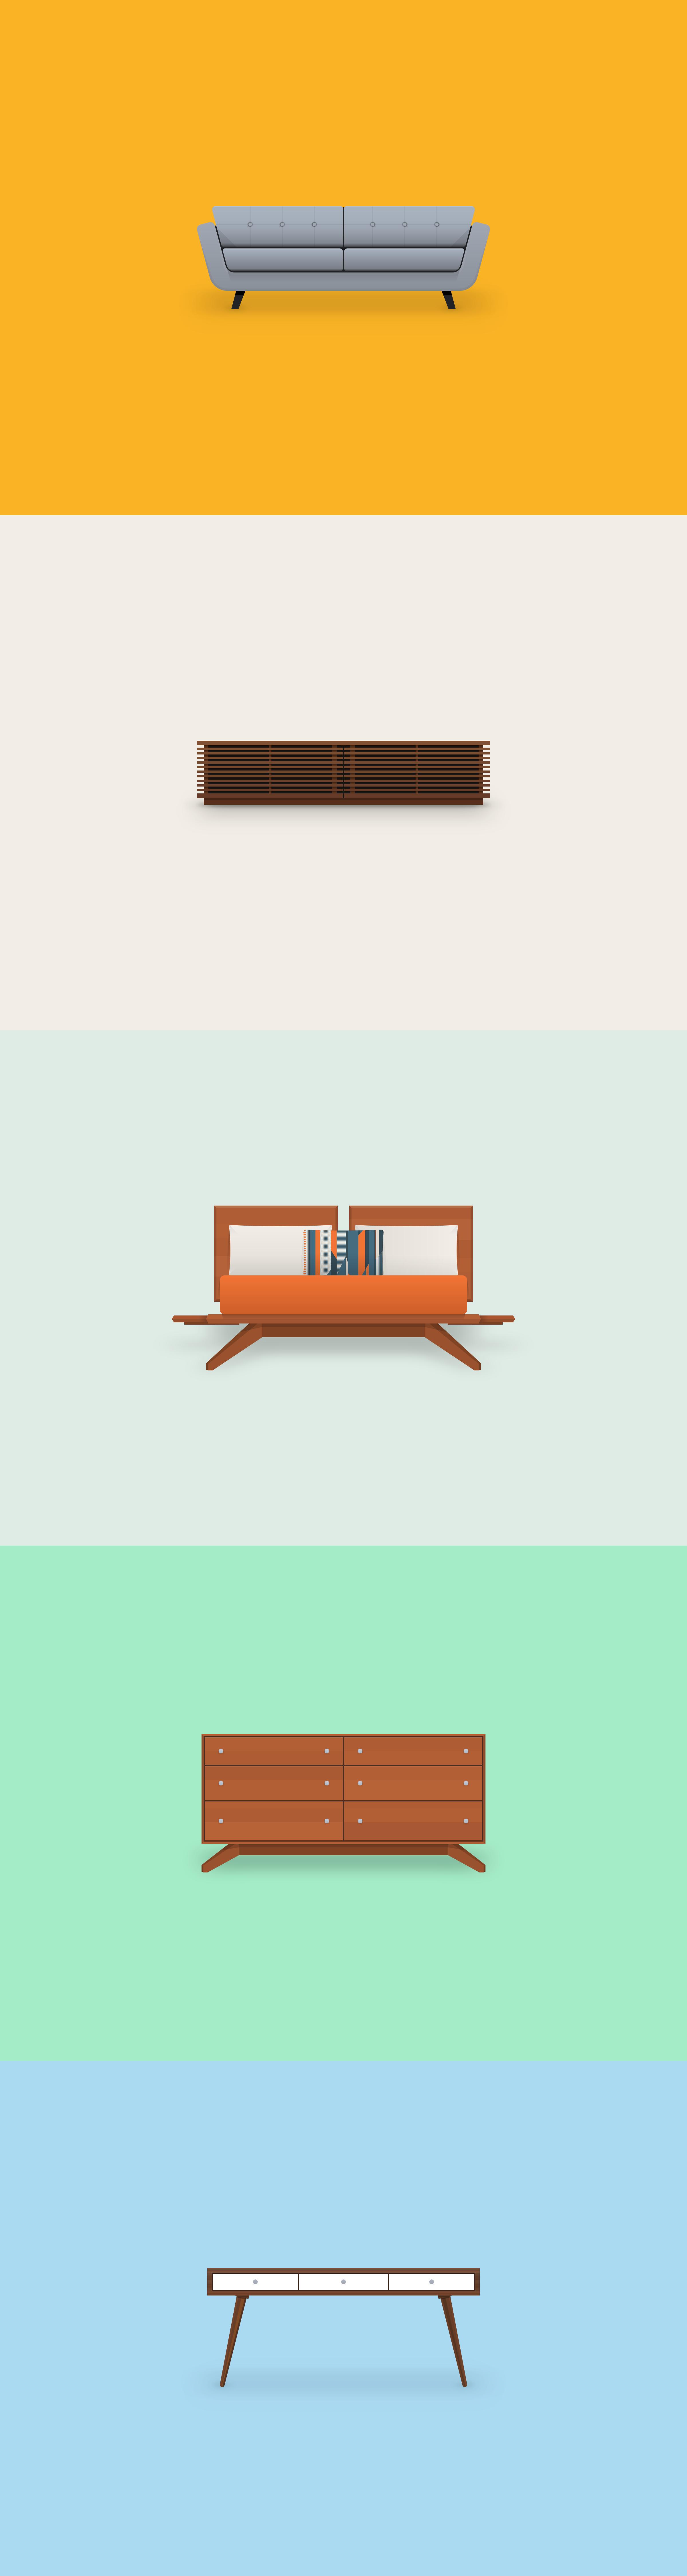 Furniture large 2x